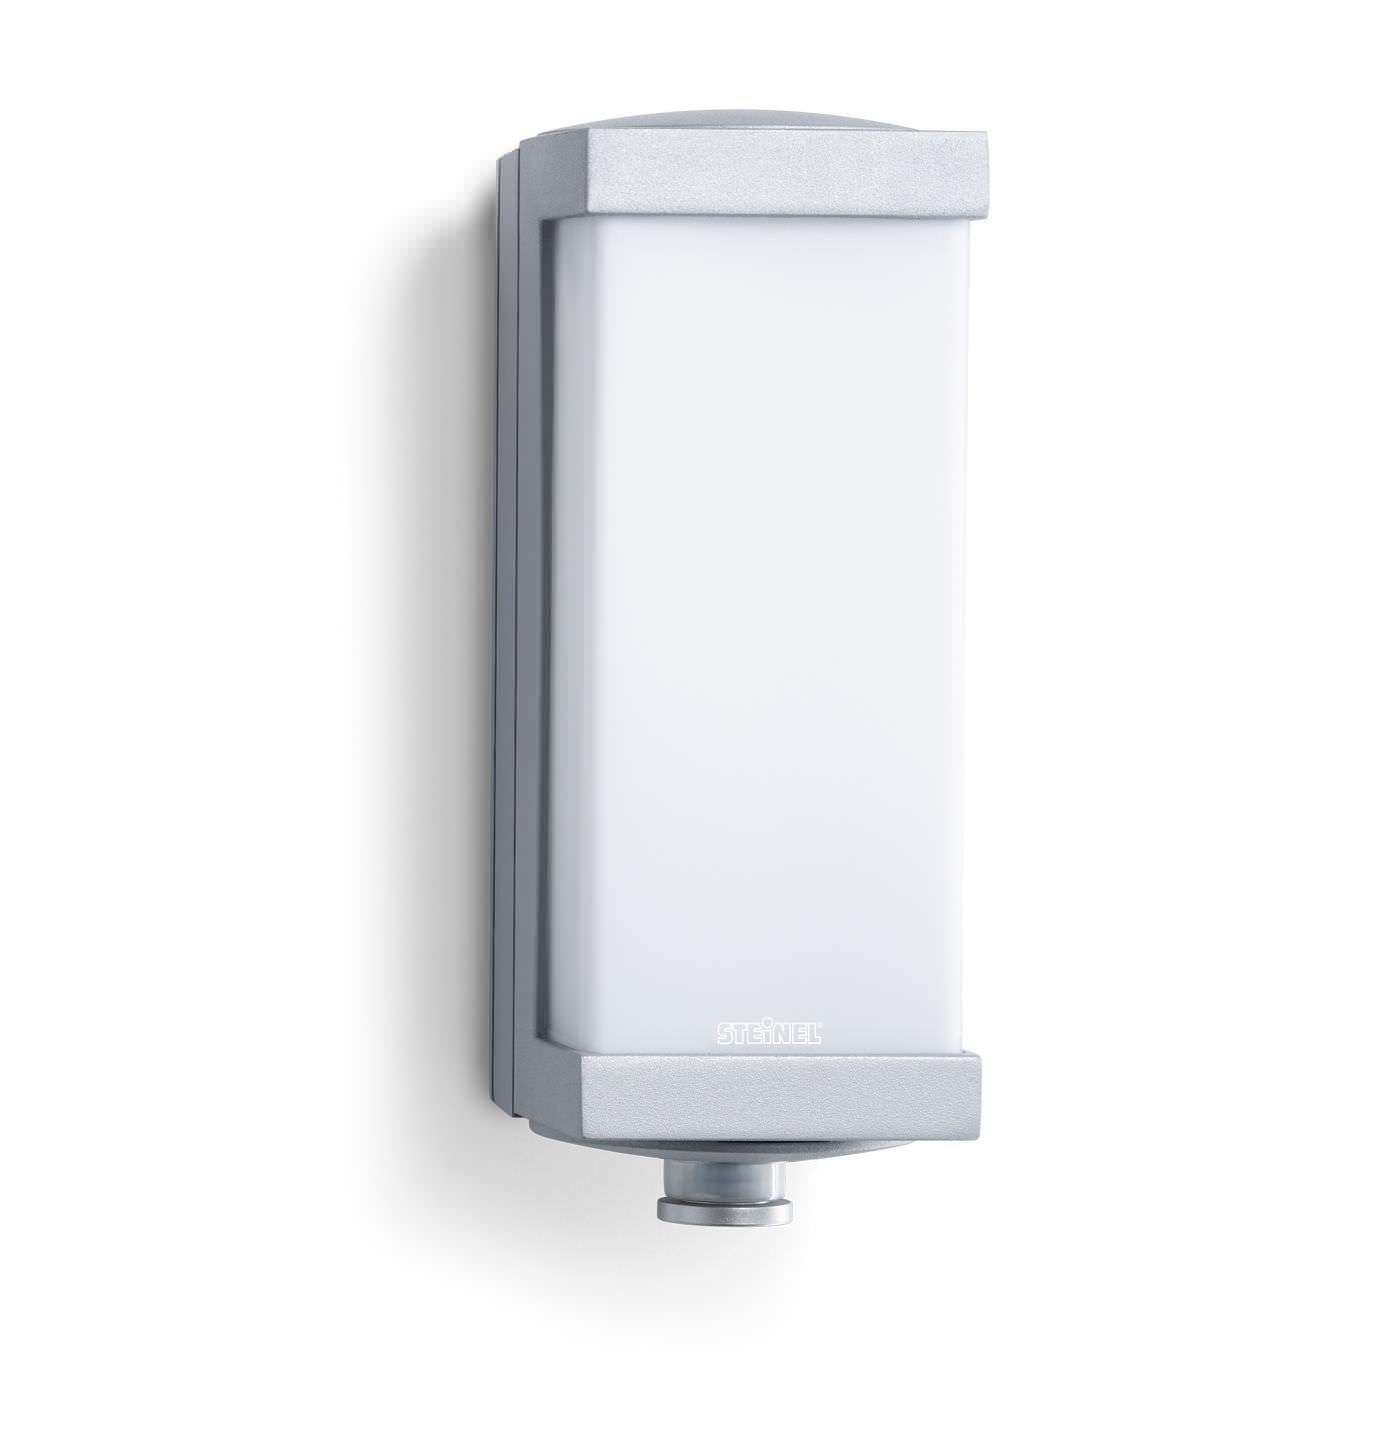 Outdoor Led Wall Lights With Sensor • Led Lights Design With Regard To Outdoor Led Wall Lights With Sensor (View 5 of 15)